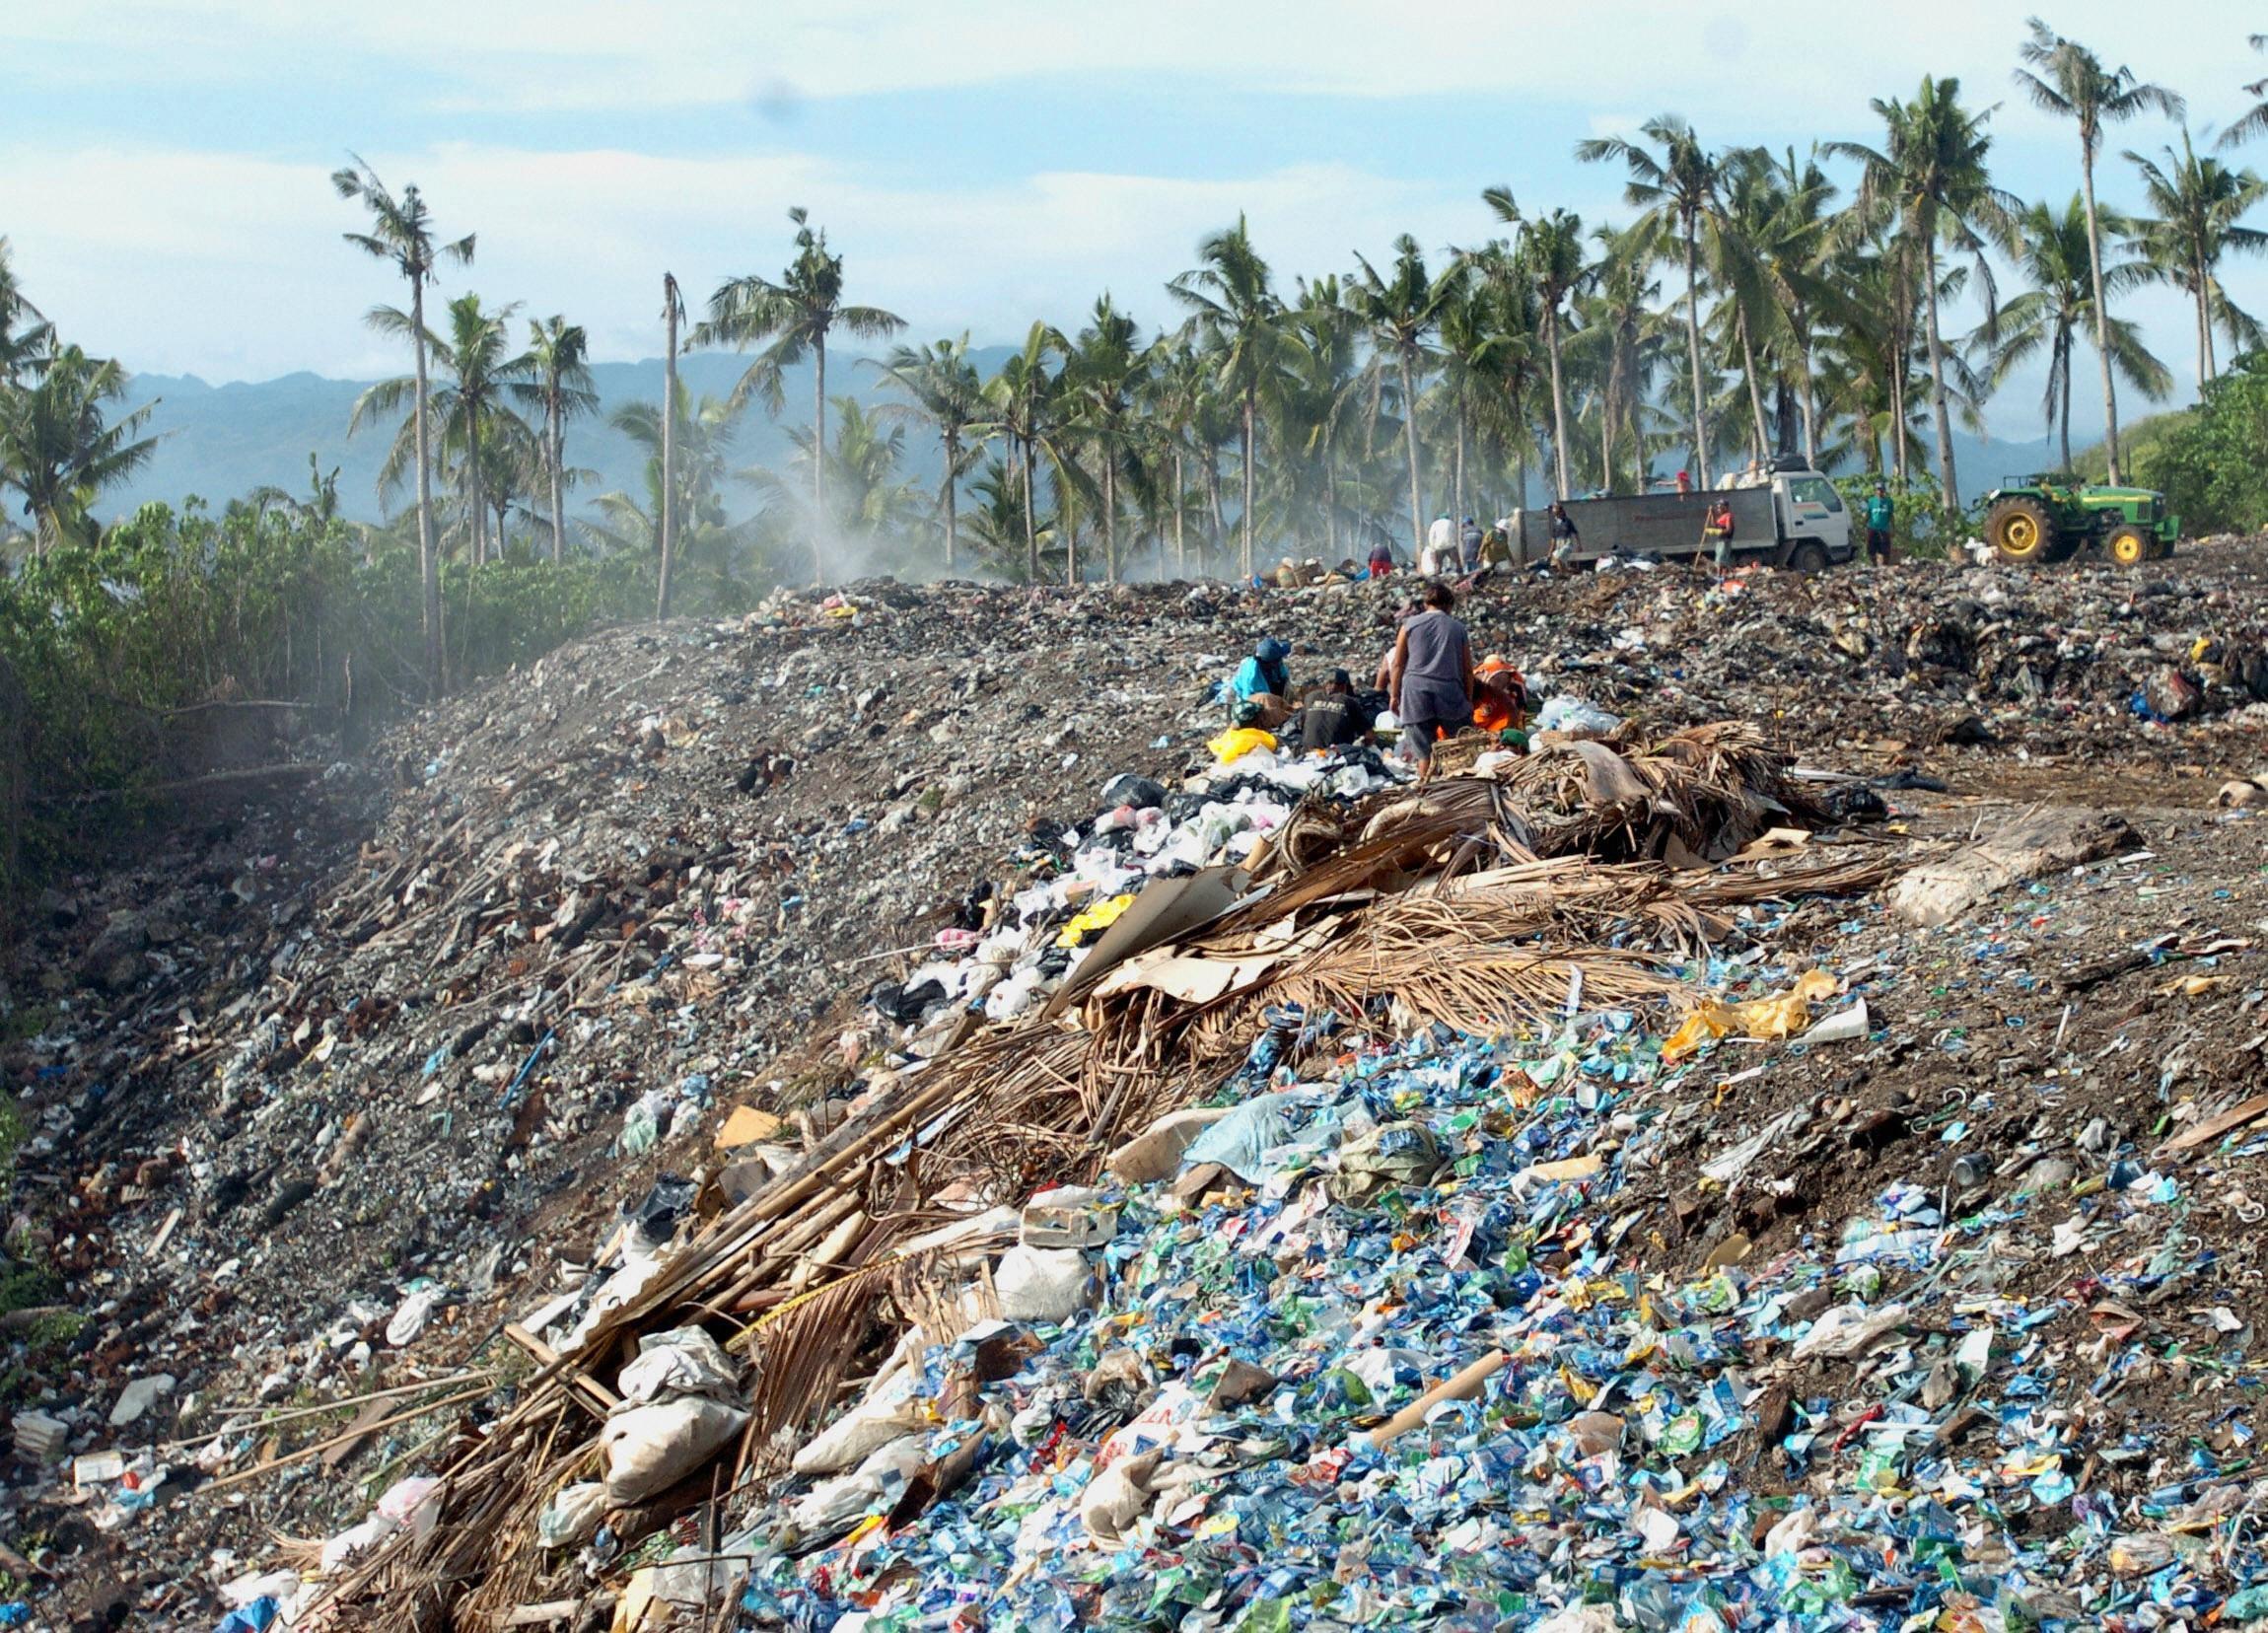 Basura en Boracay